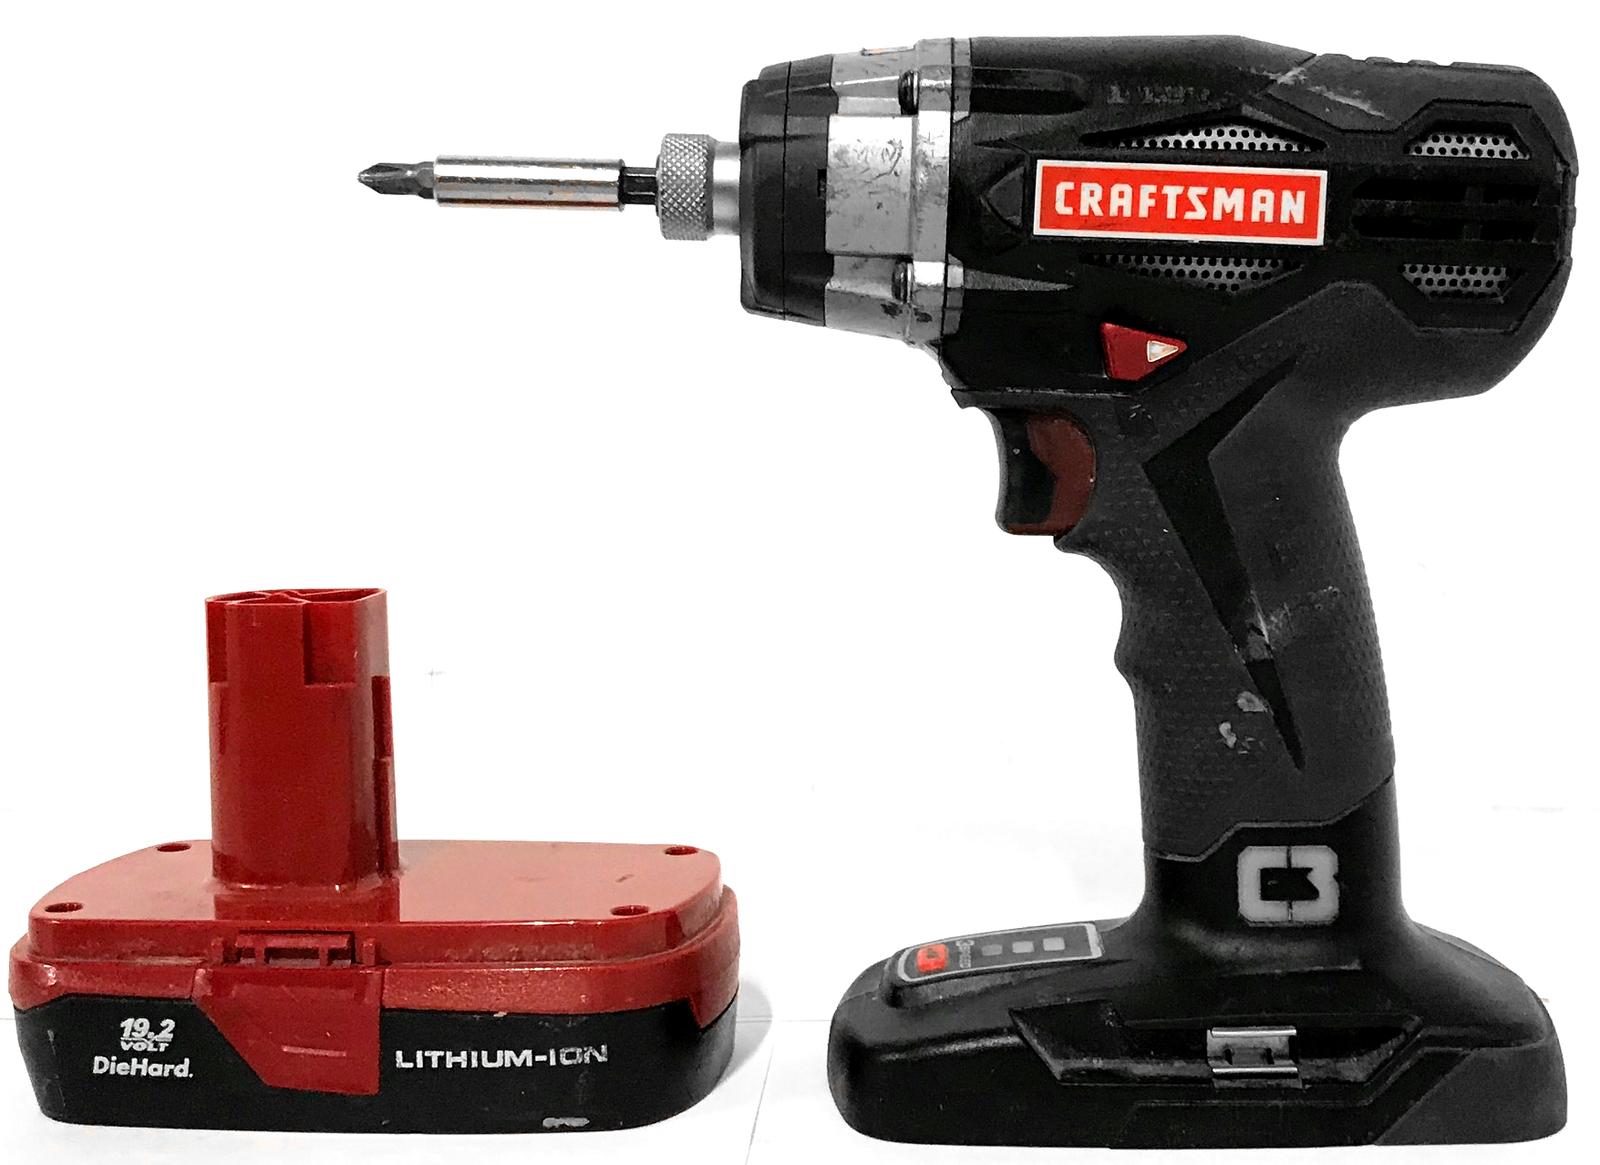 Craftsman Cordless Hand Tools 315.id2025 image 4